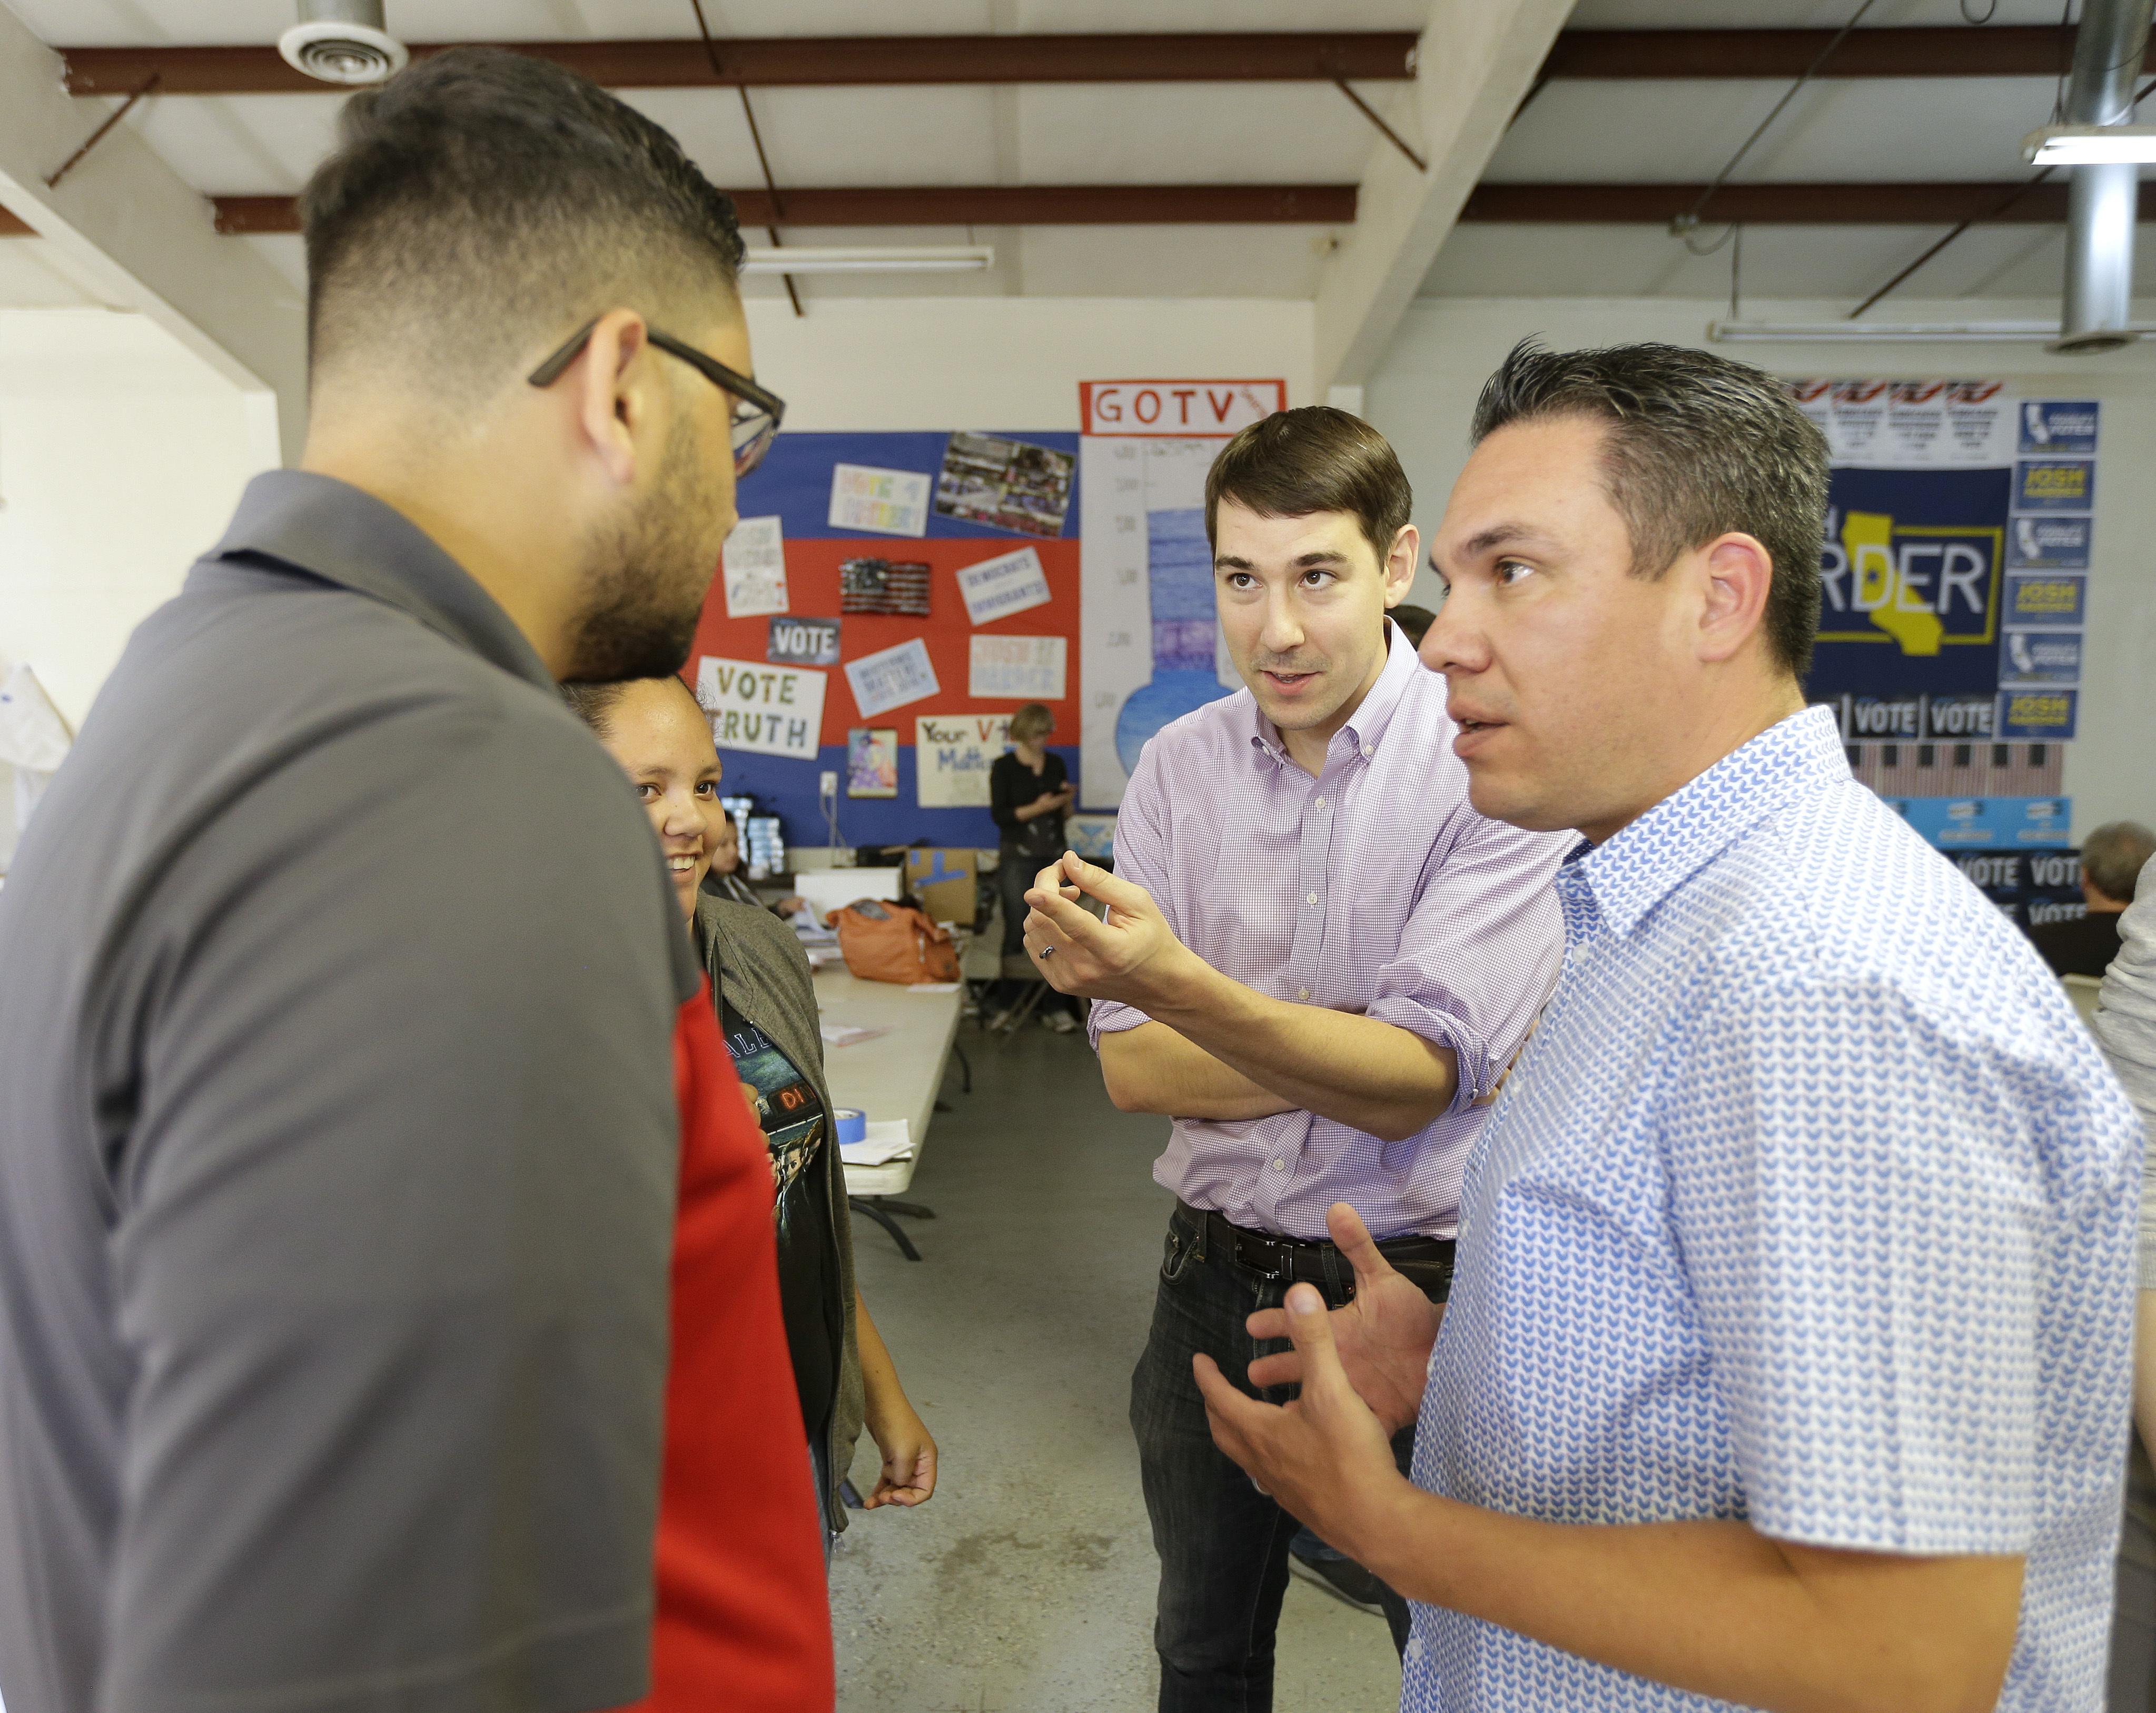 Democrat Harder ousts California GOP US Rep. Denham